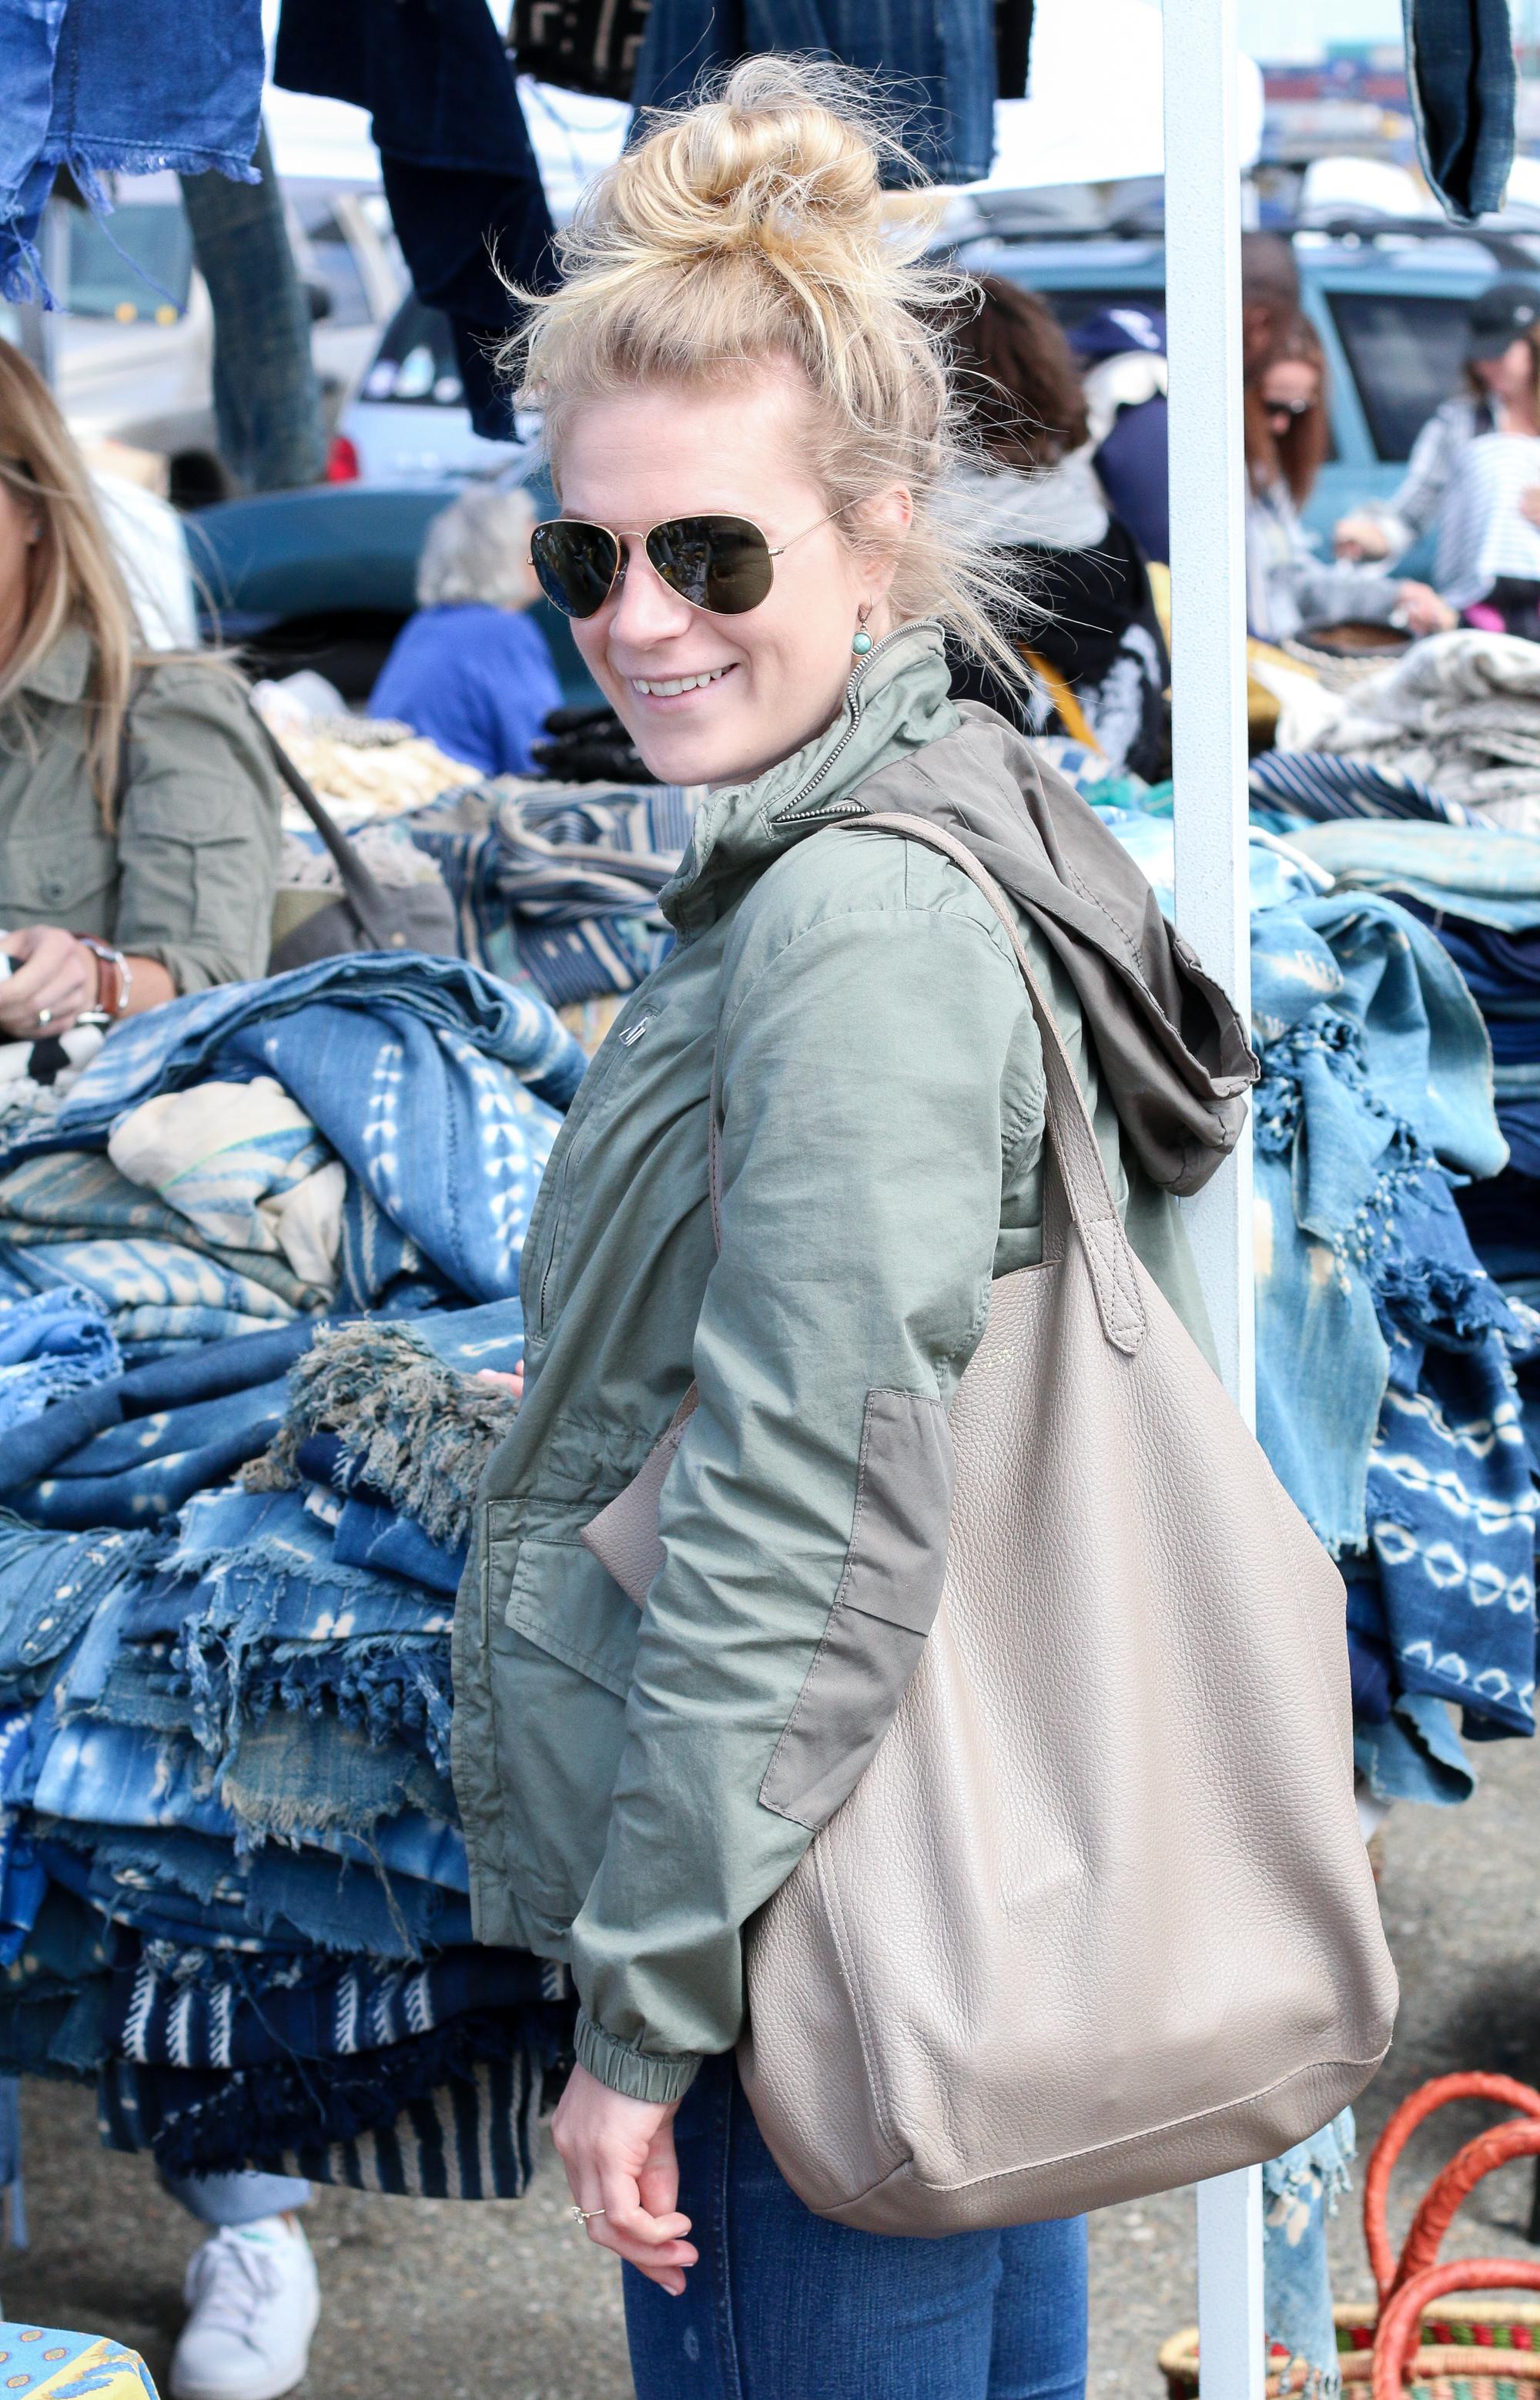 Adventures at the Alameda Flea Market.